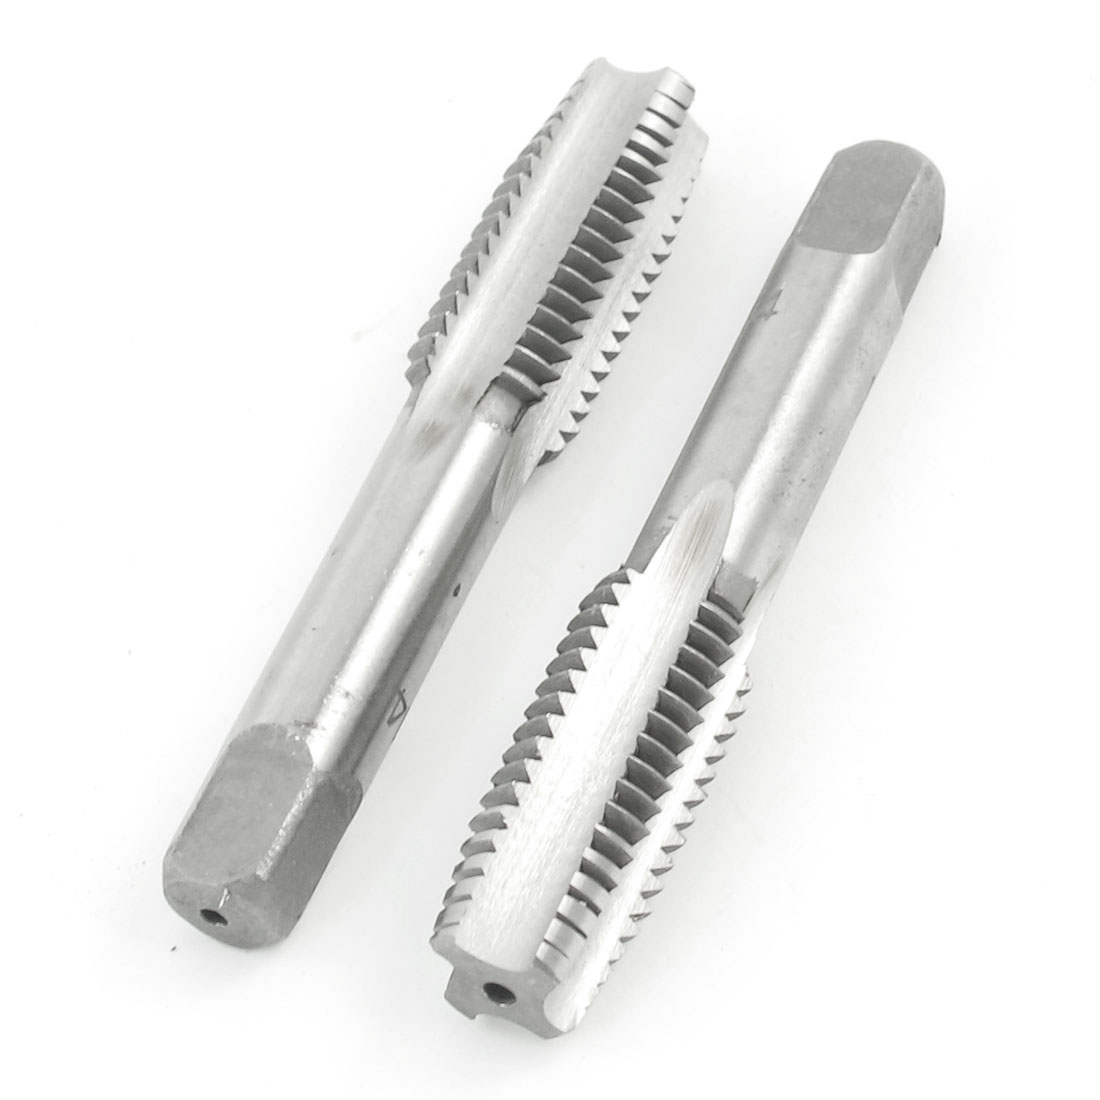 2 Pcs Straight M14 Dia. Screw Type Flute Bottom Connector Tap Bits